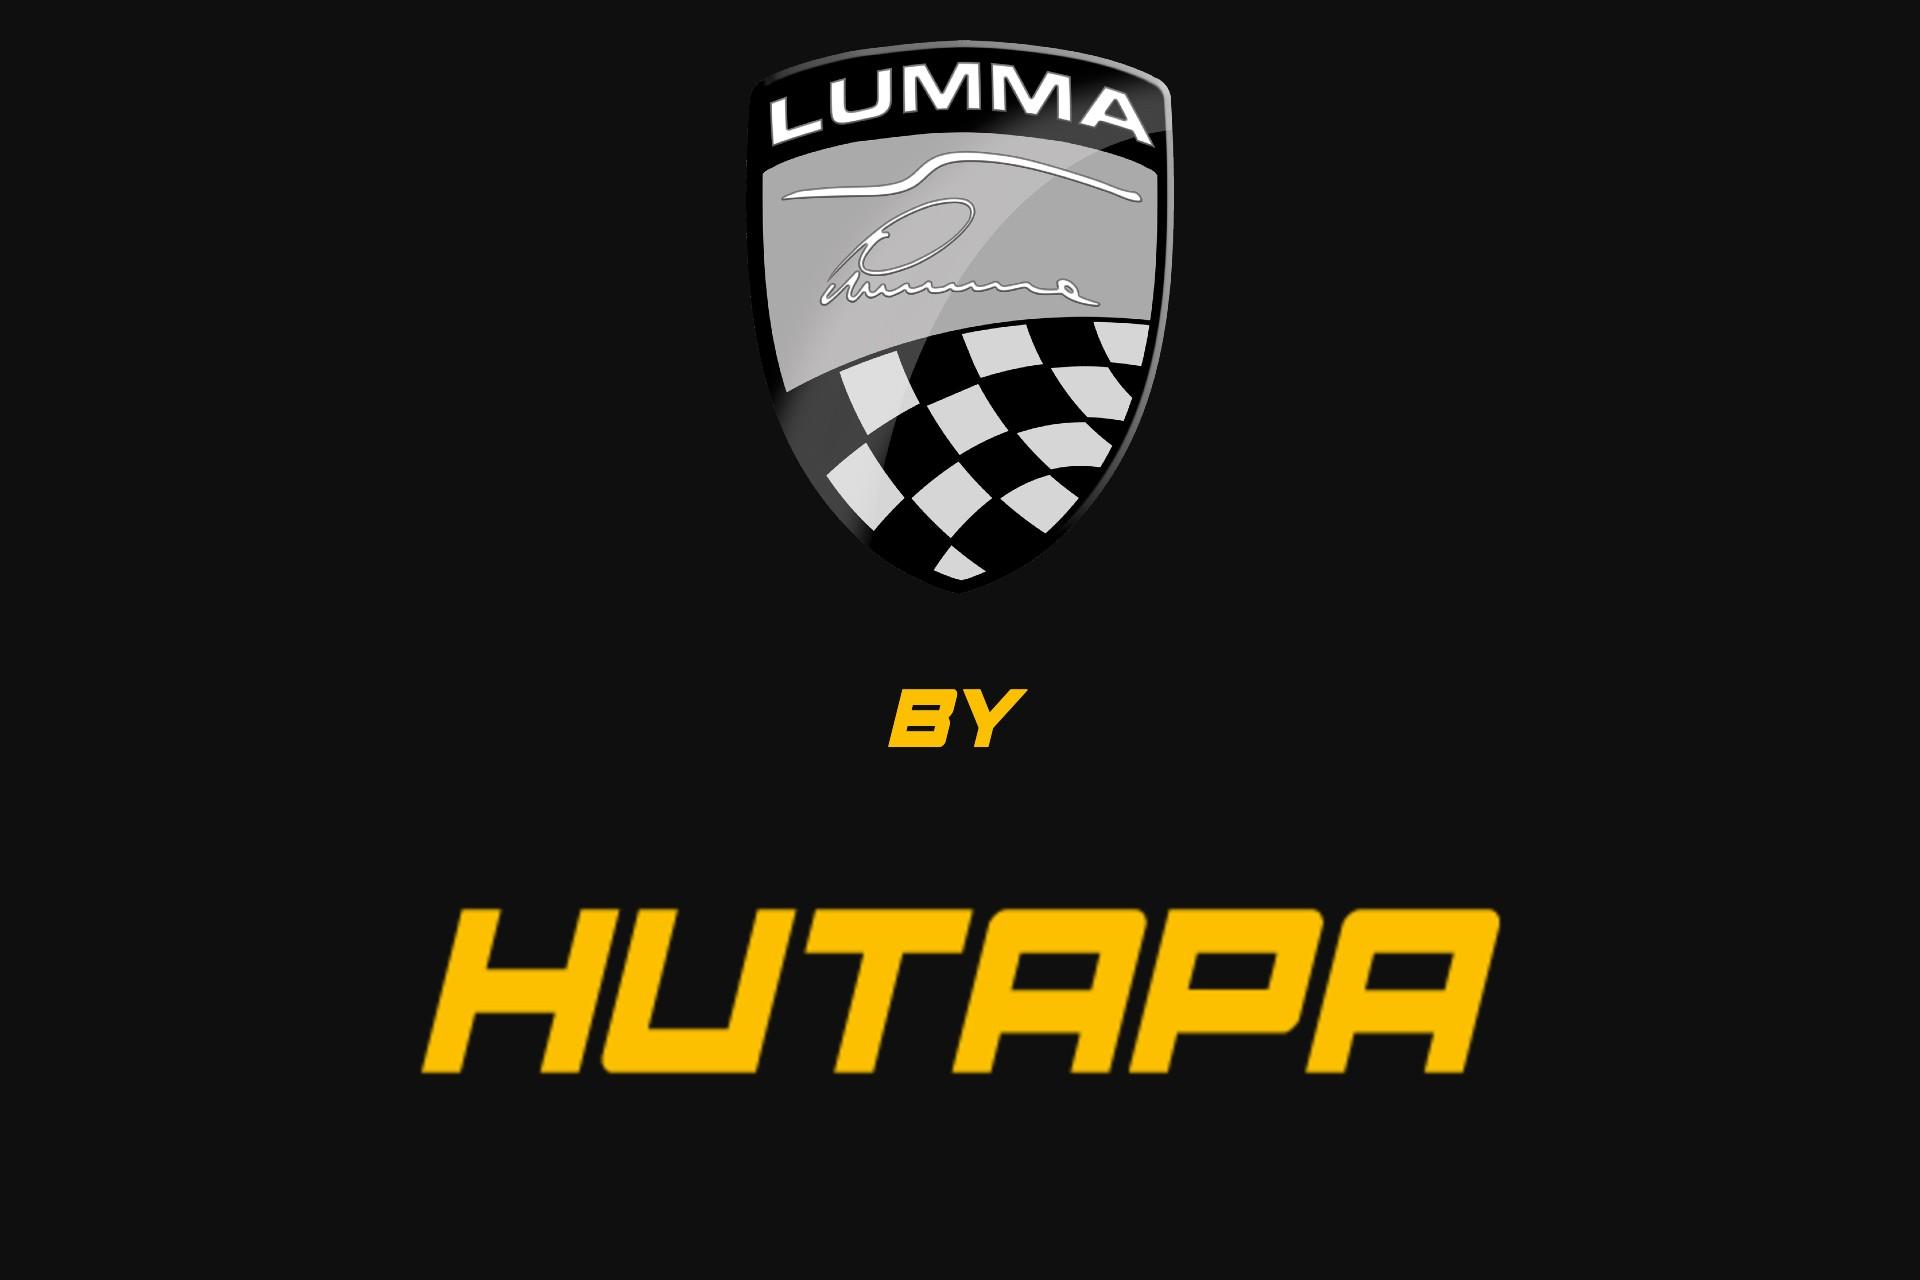 Lumma by Hutapa - Autogarage Hutapa